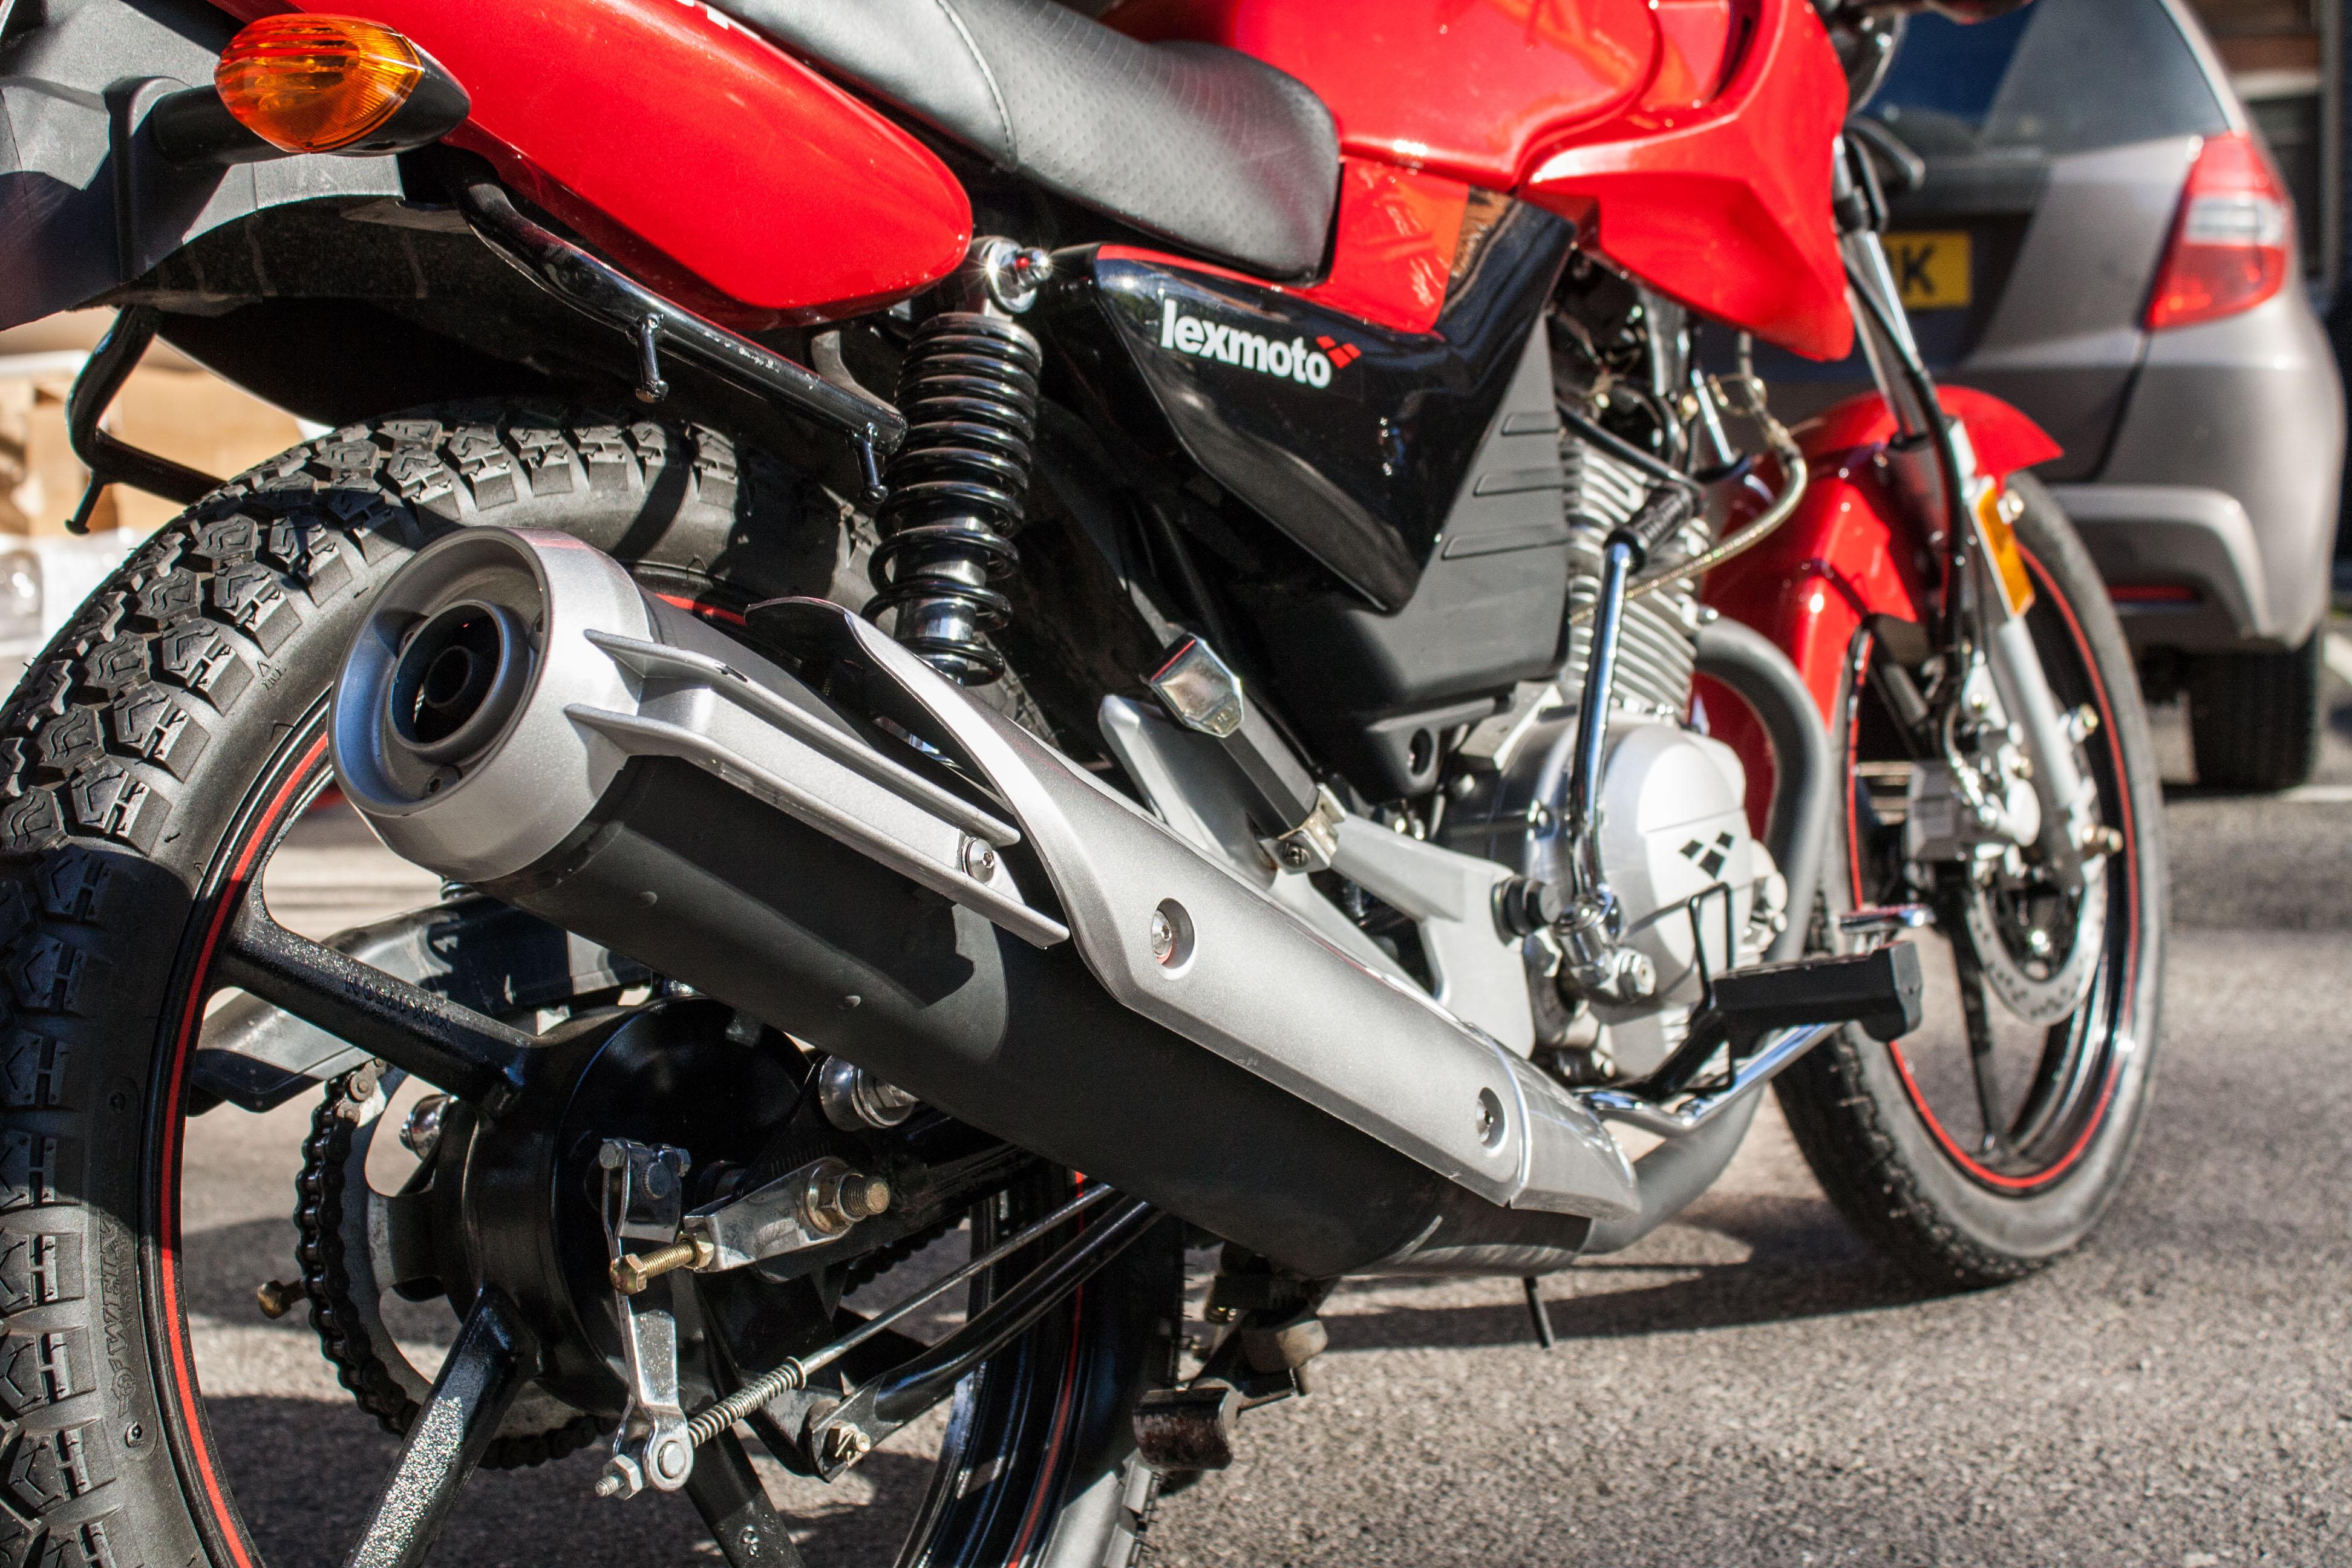 First ride: Lexmoto ZSF 125 review